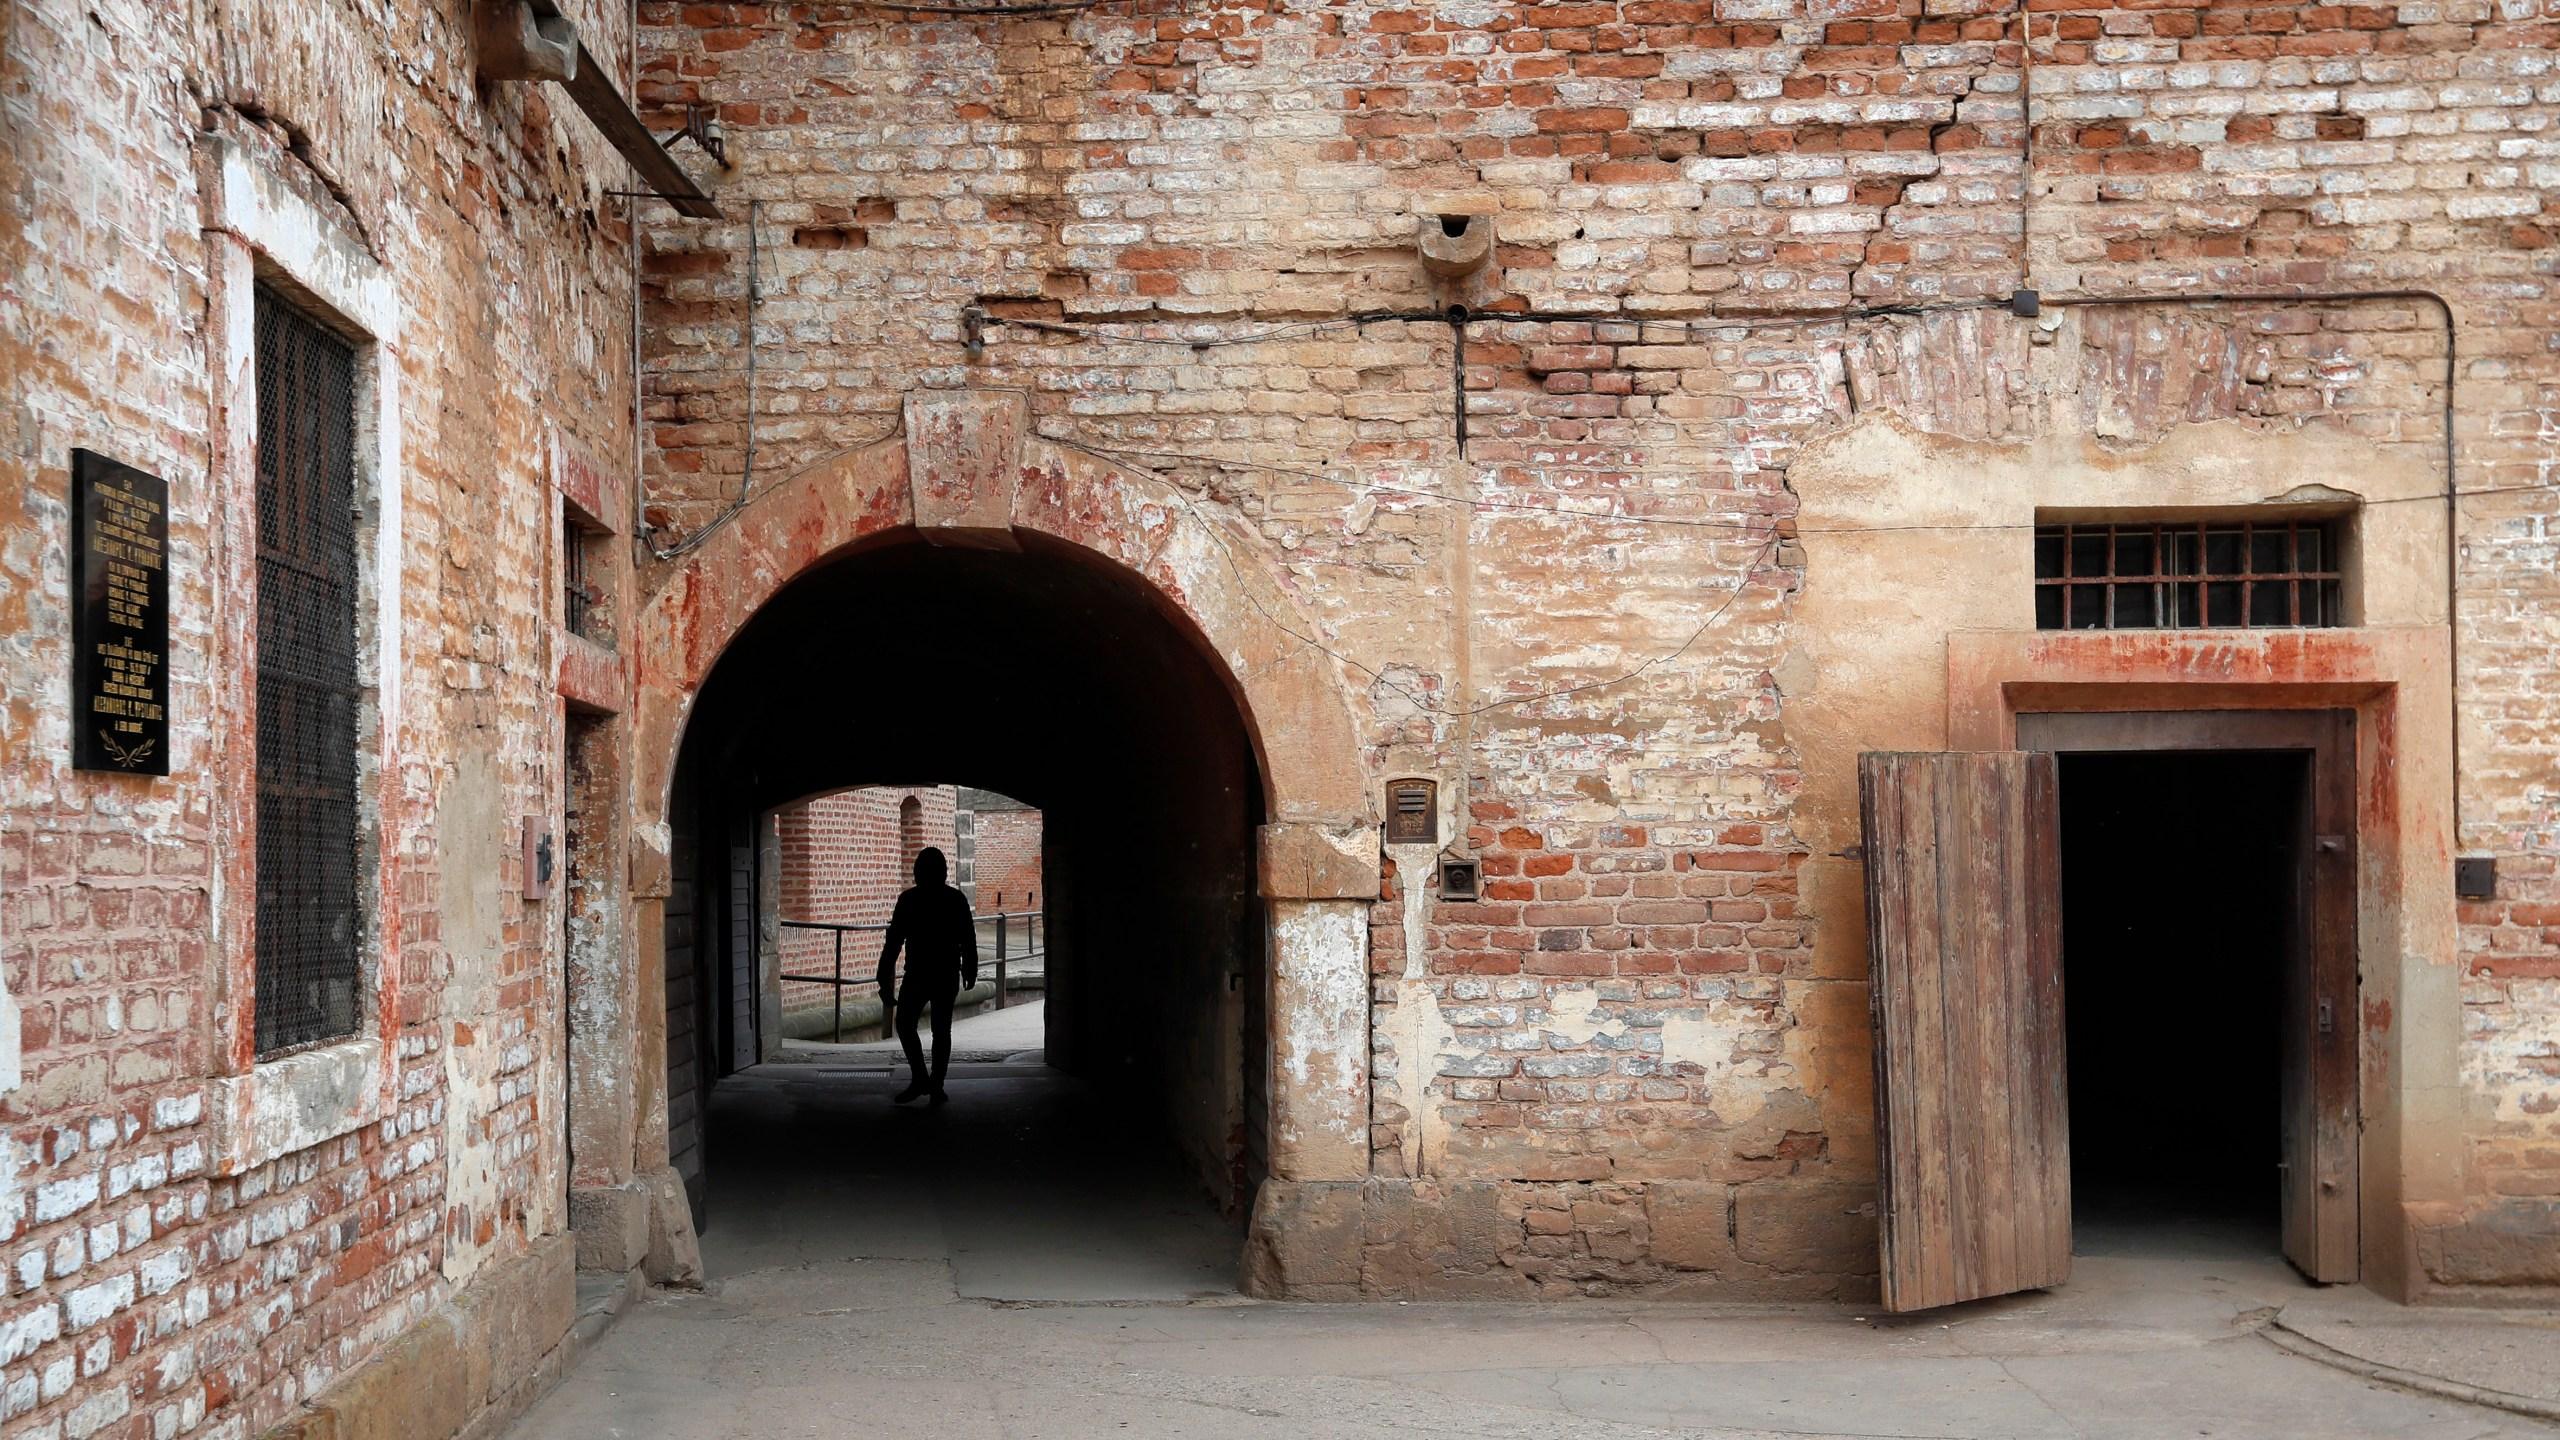 Czech_Republic_Holocaust_Photo_Gallery_71202-159532.jpg88433194